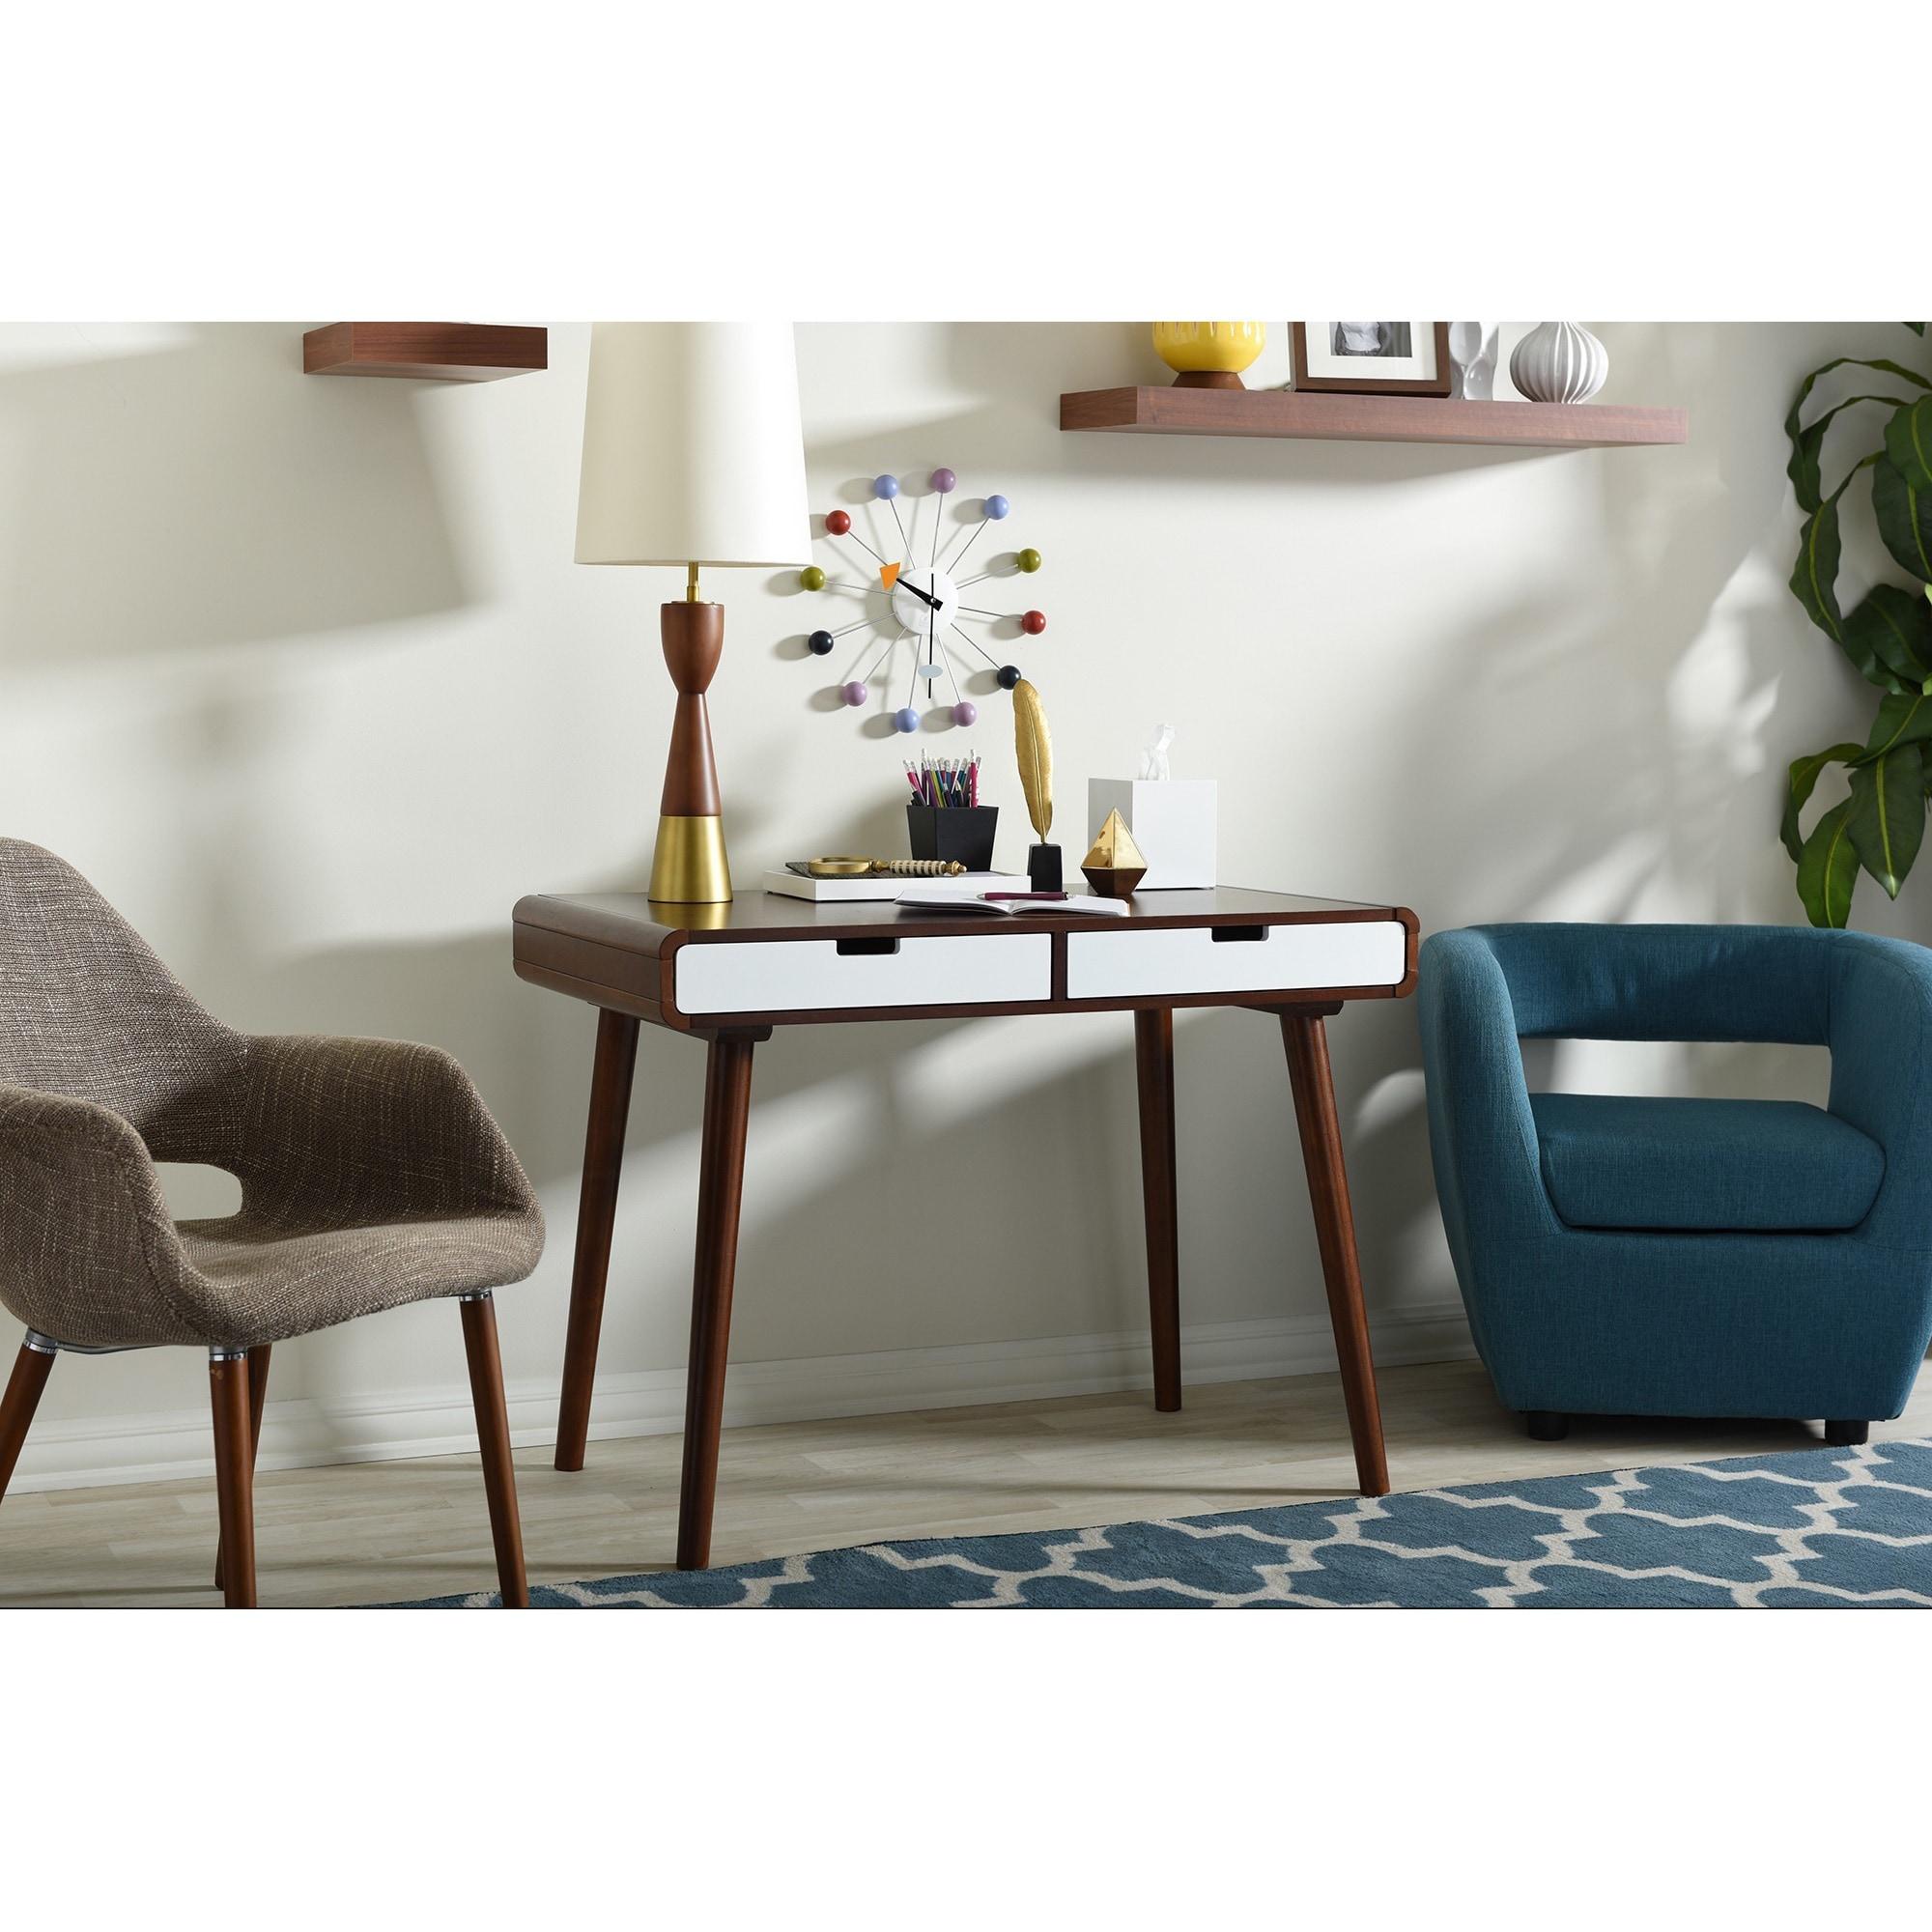 Baxton Studio Casarano Mid Century Dark Walnut And White Two Tone Finish 2 Drawer Wood Writing Desk Overstock 10669649